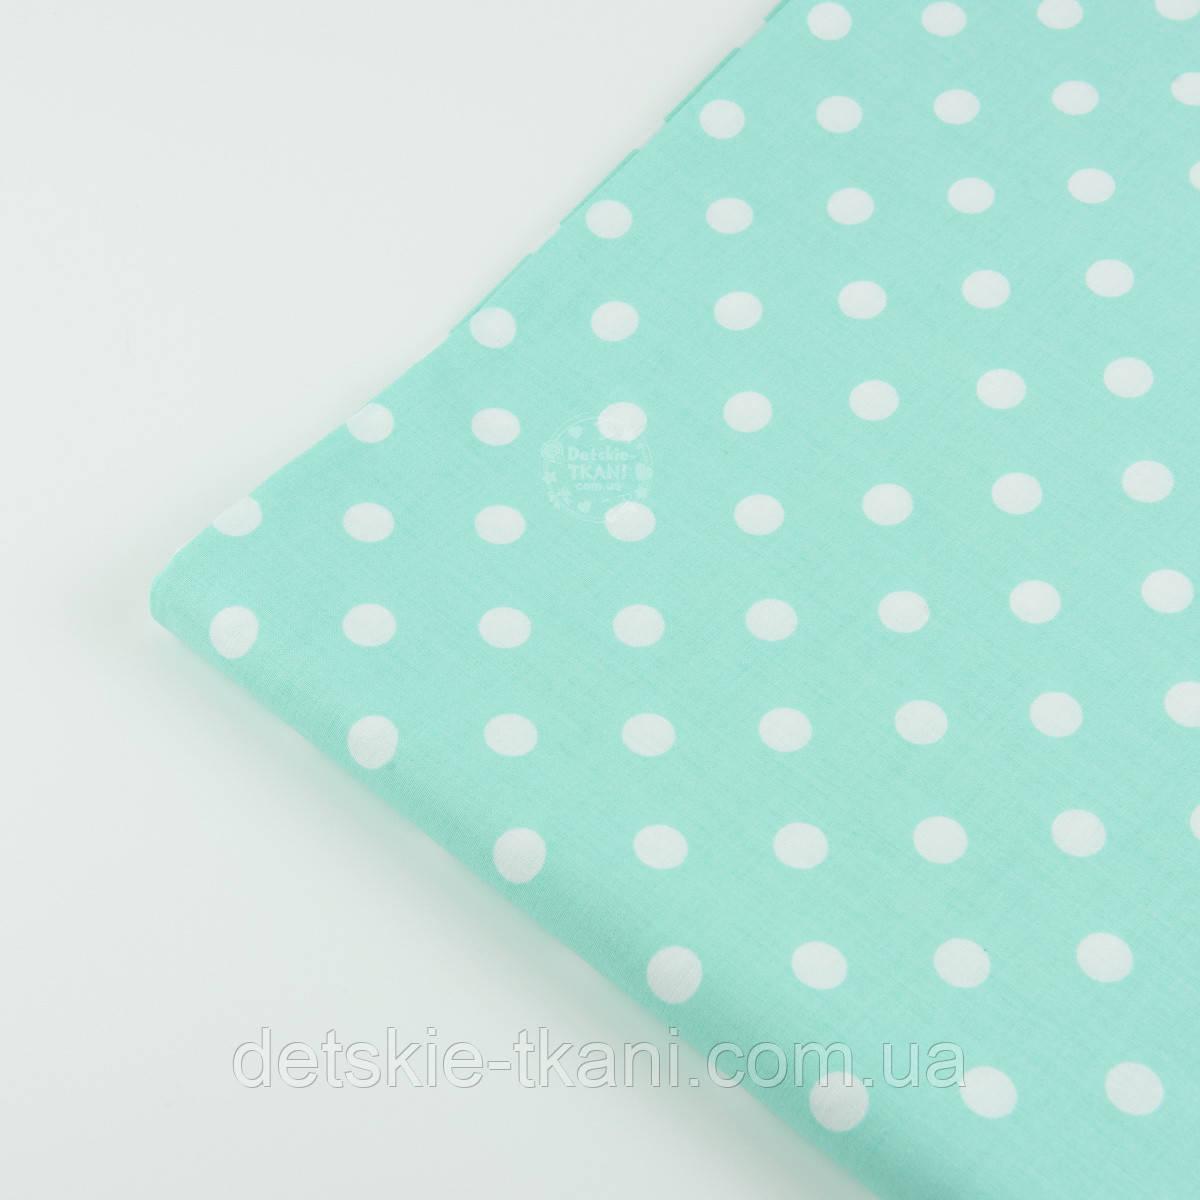 Лоскут ткани №524   с белым горошком 11 мм на мятном фоне